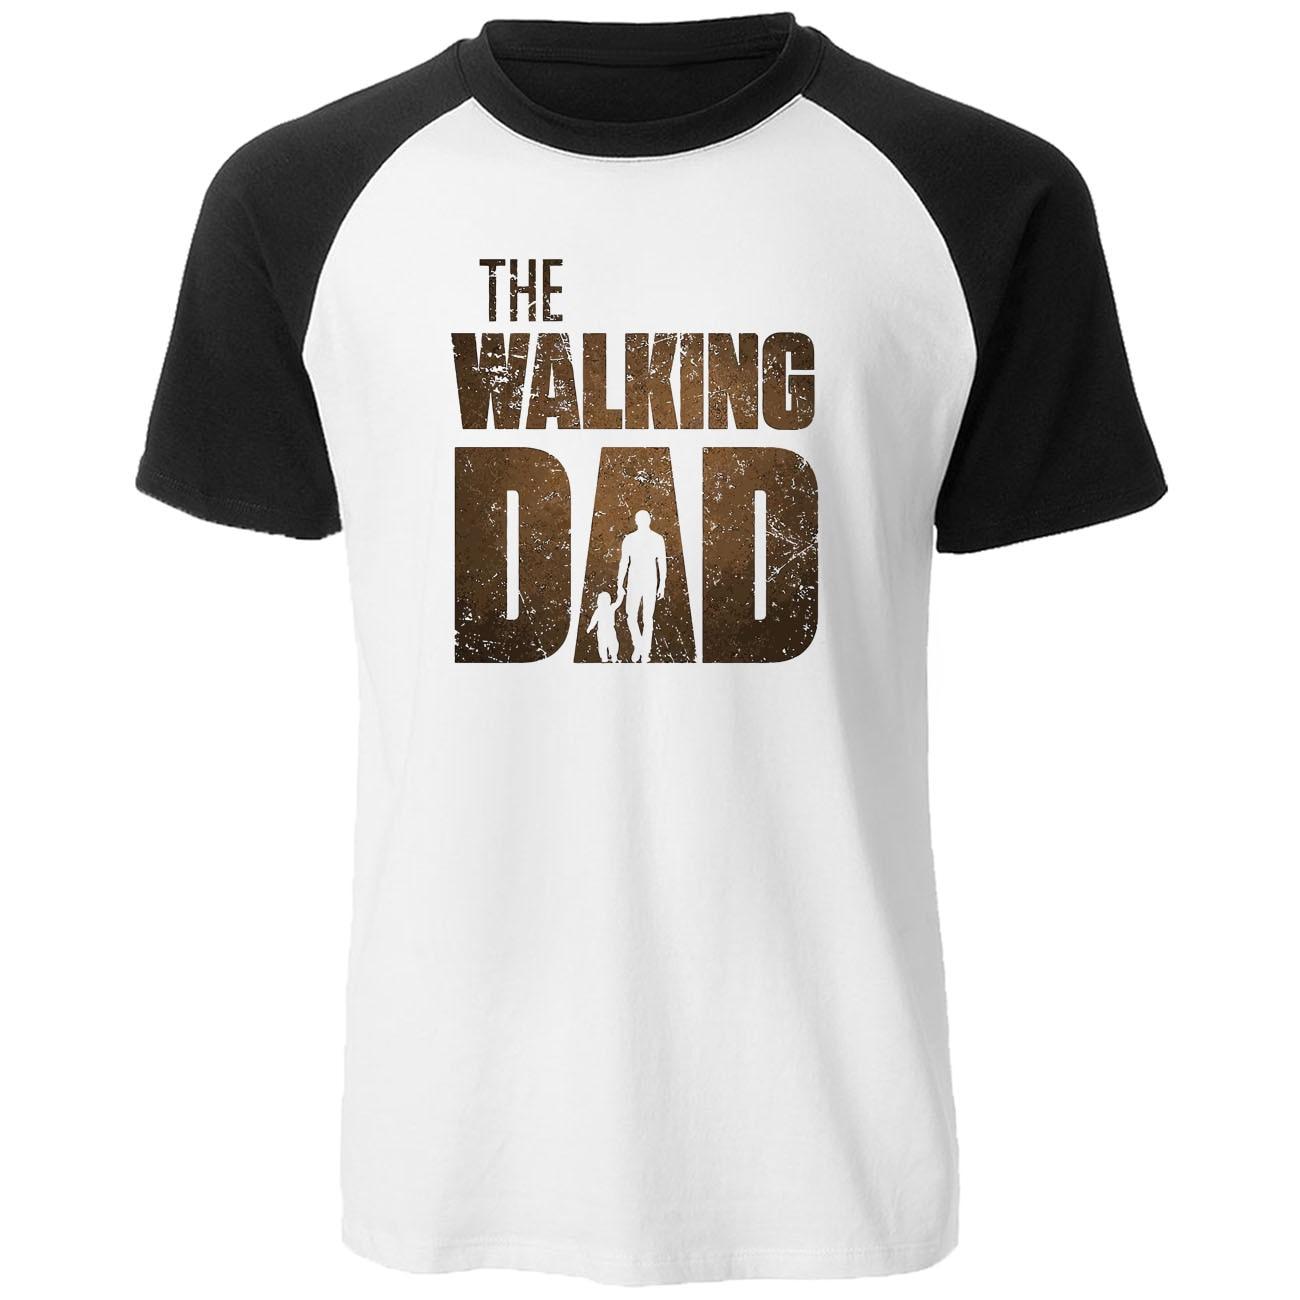 2019 Summer High Quality Cotton Mens Short Sleeve Tshirt Negan Rick The Walking Dad T-Shirt Printed Hip Hop Raglan Men T Shirts